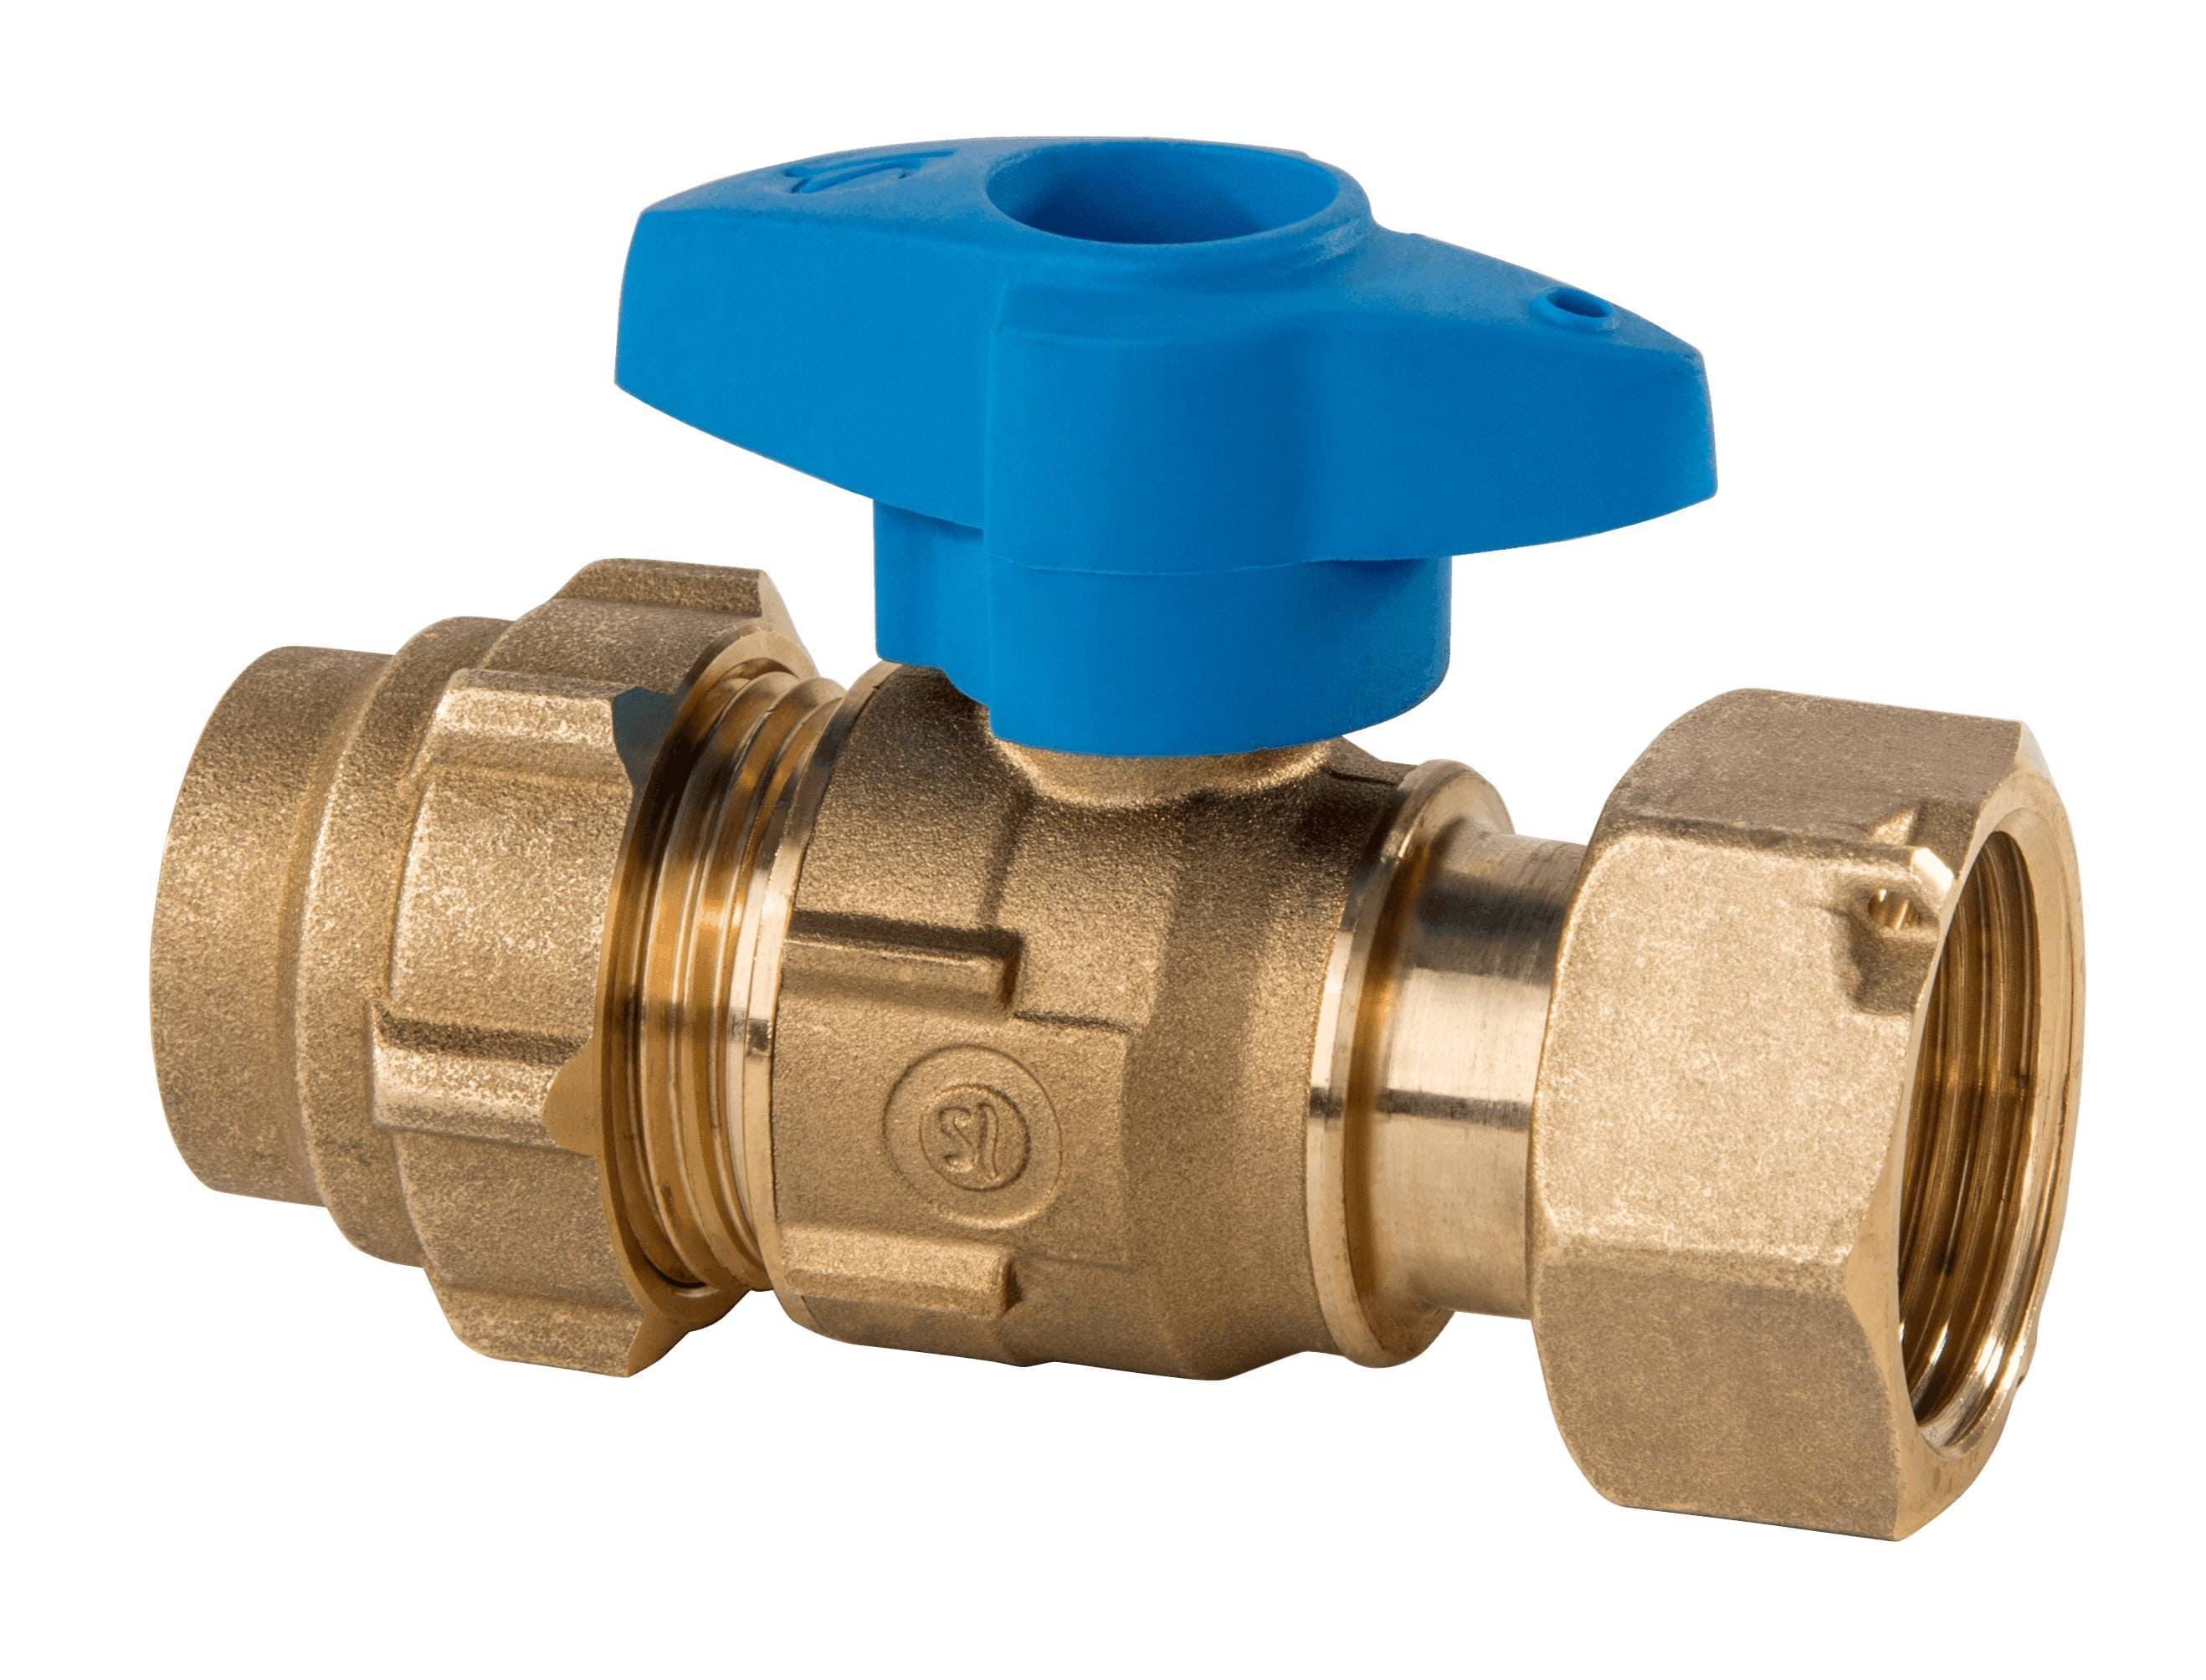 robinet-avant-compteur-droit-manoeuvre-standard-raccord-818.jpg